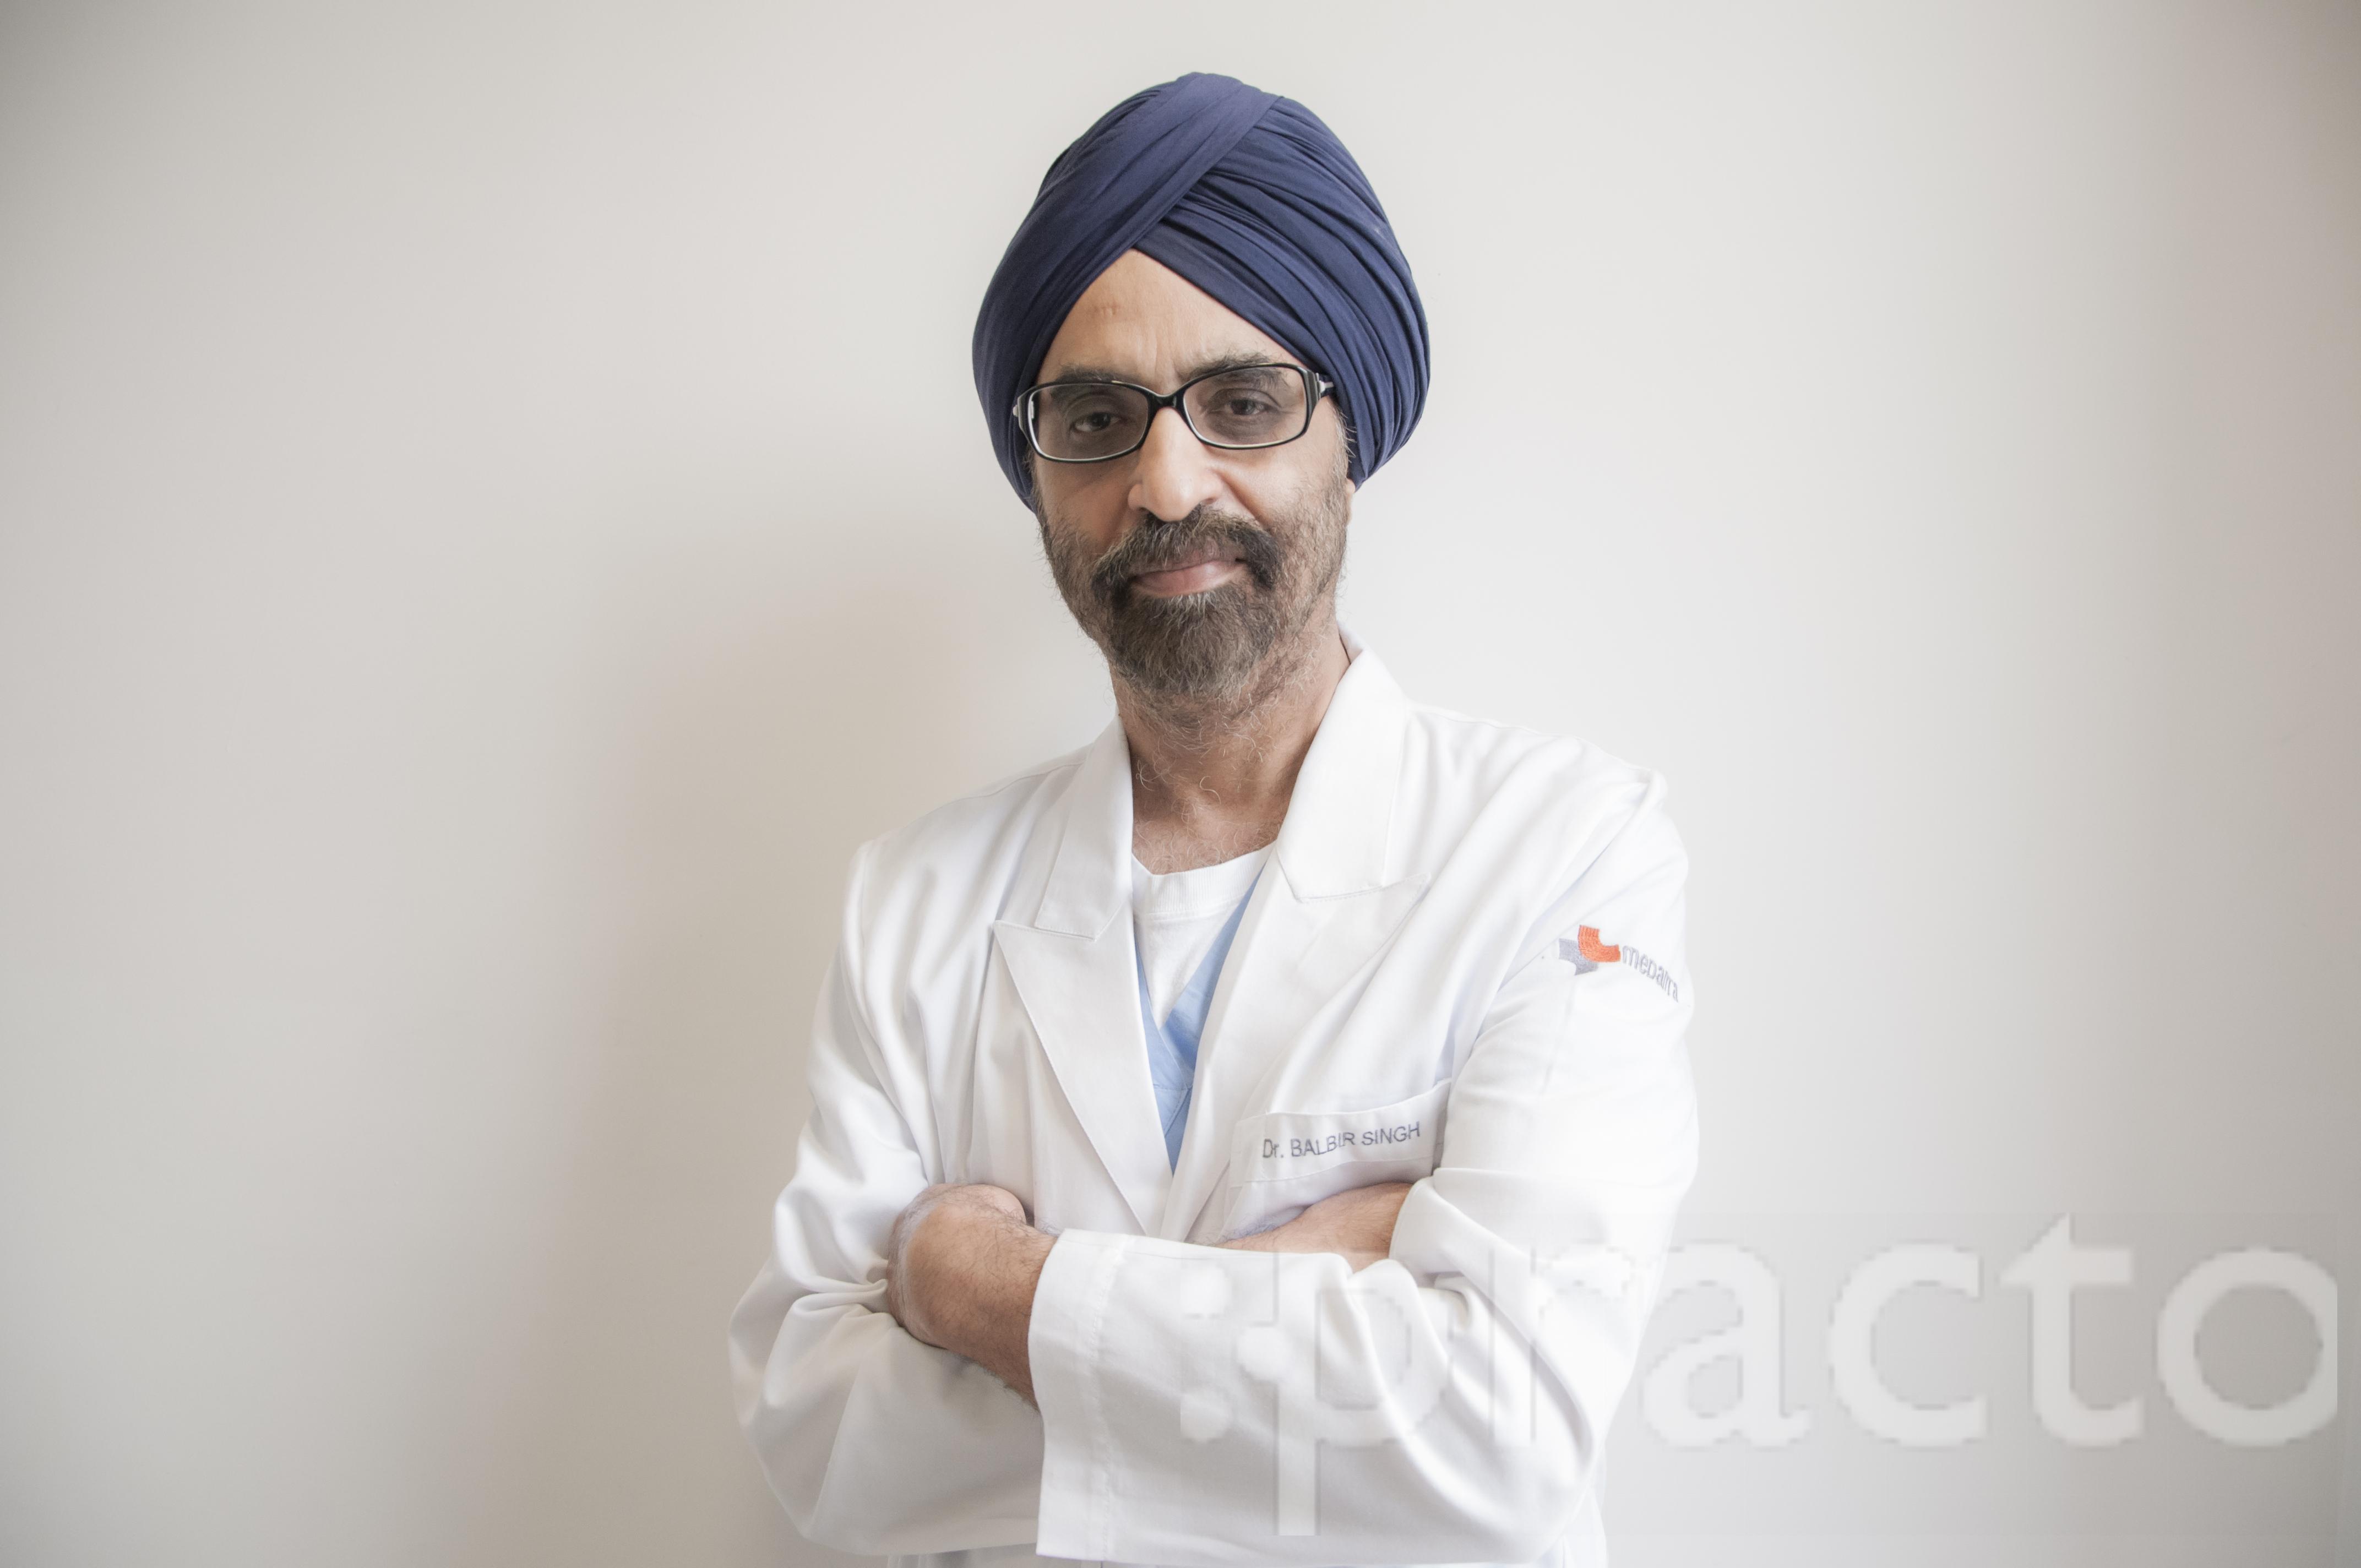 Dr. Balbir Singh - Cardiologist